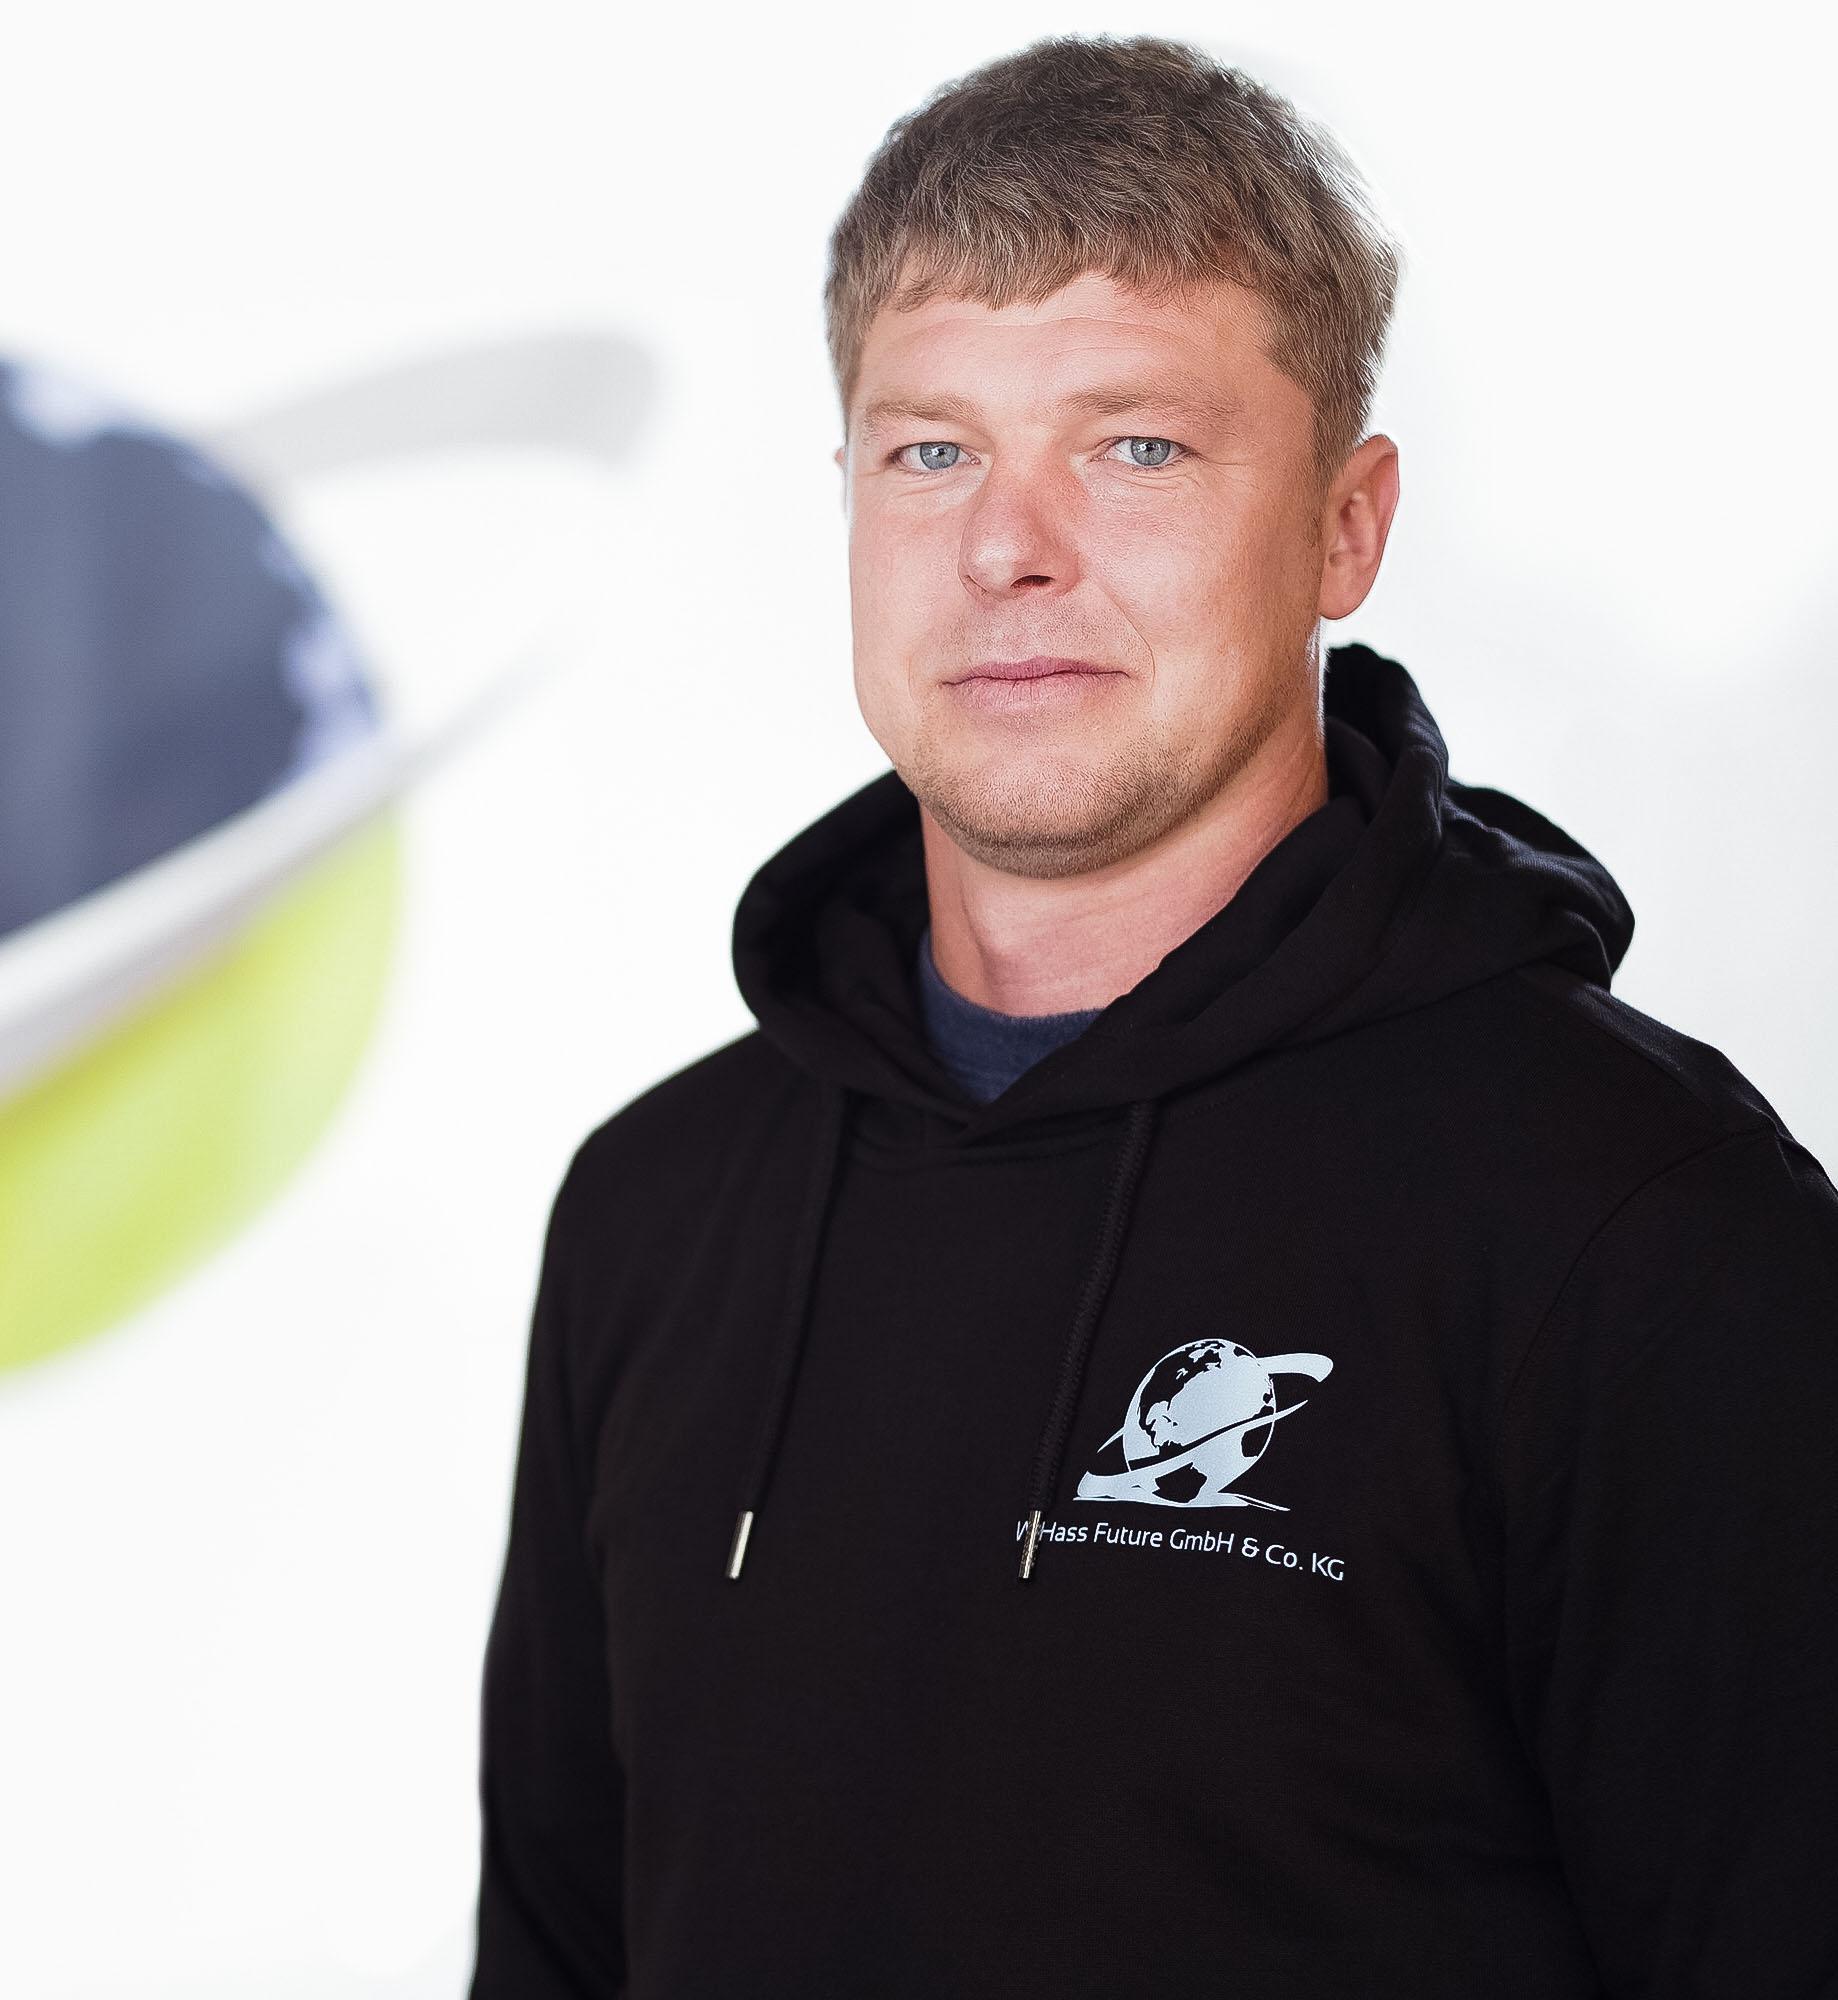 Konstantin-Wiese-Construction-Manager_02.jpg